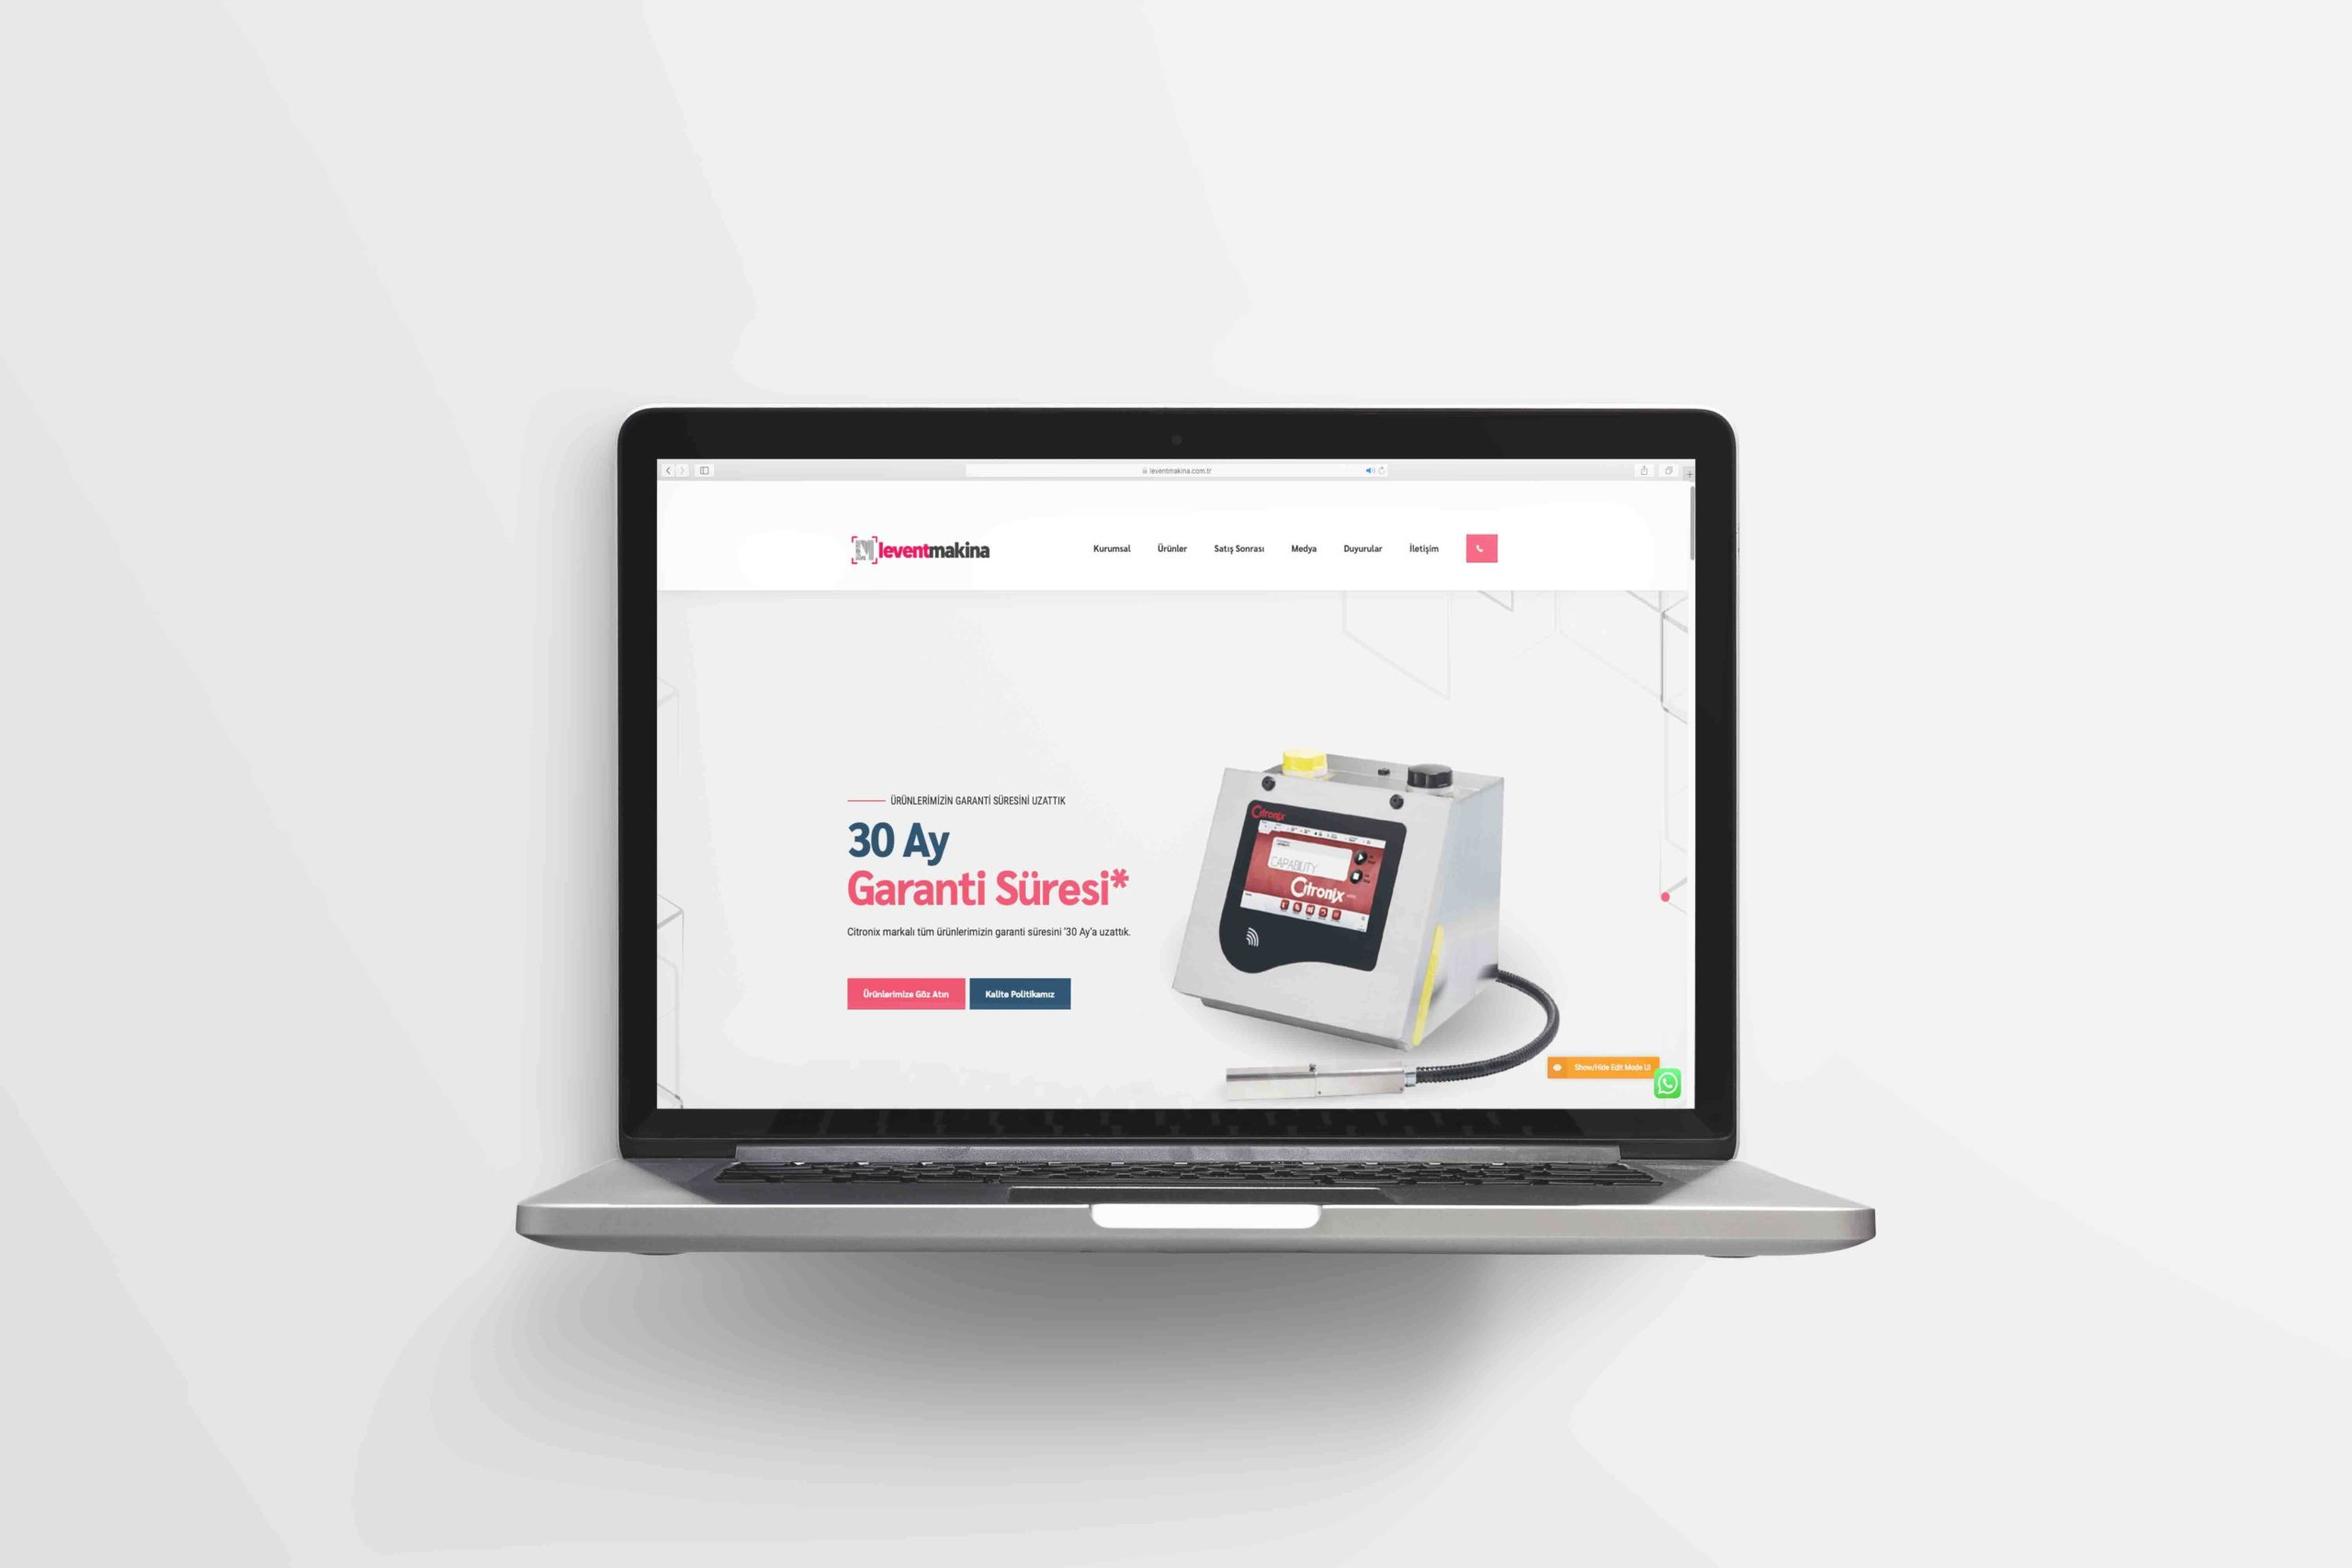 https://rdmedya.com/wp-content/uploads/2020/04/levent-makina-web-design-scaled.jpg